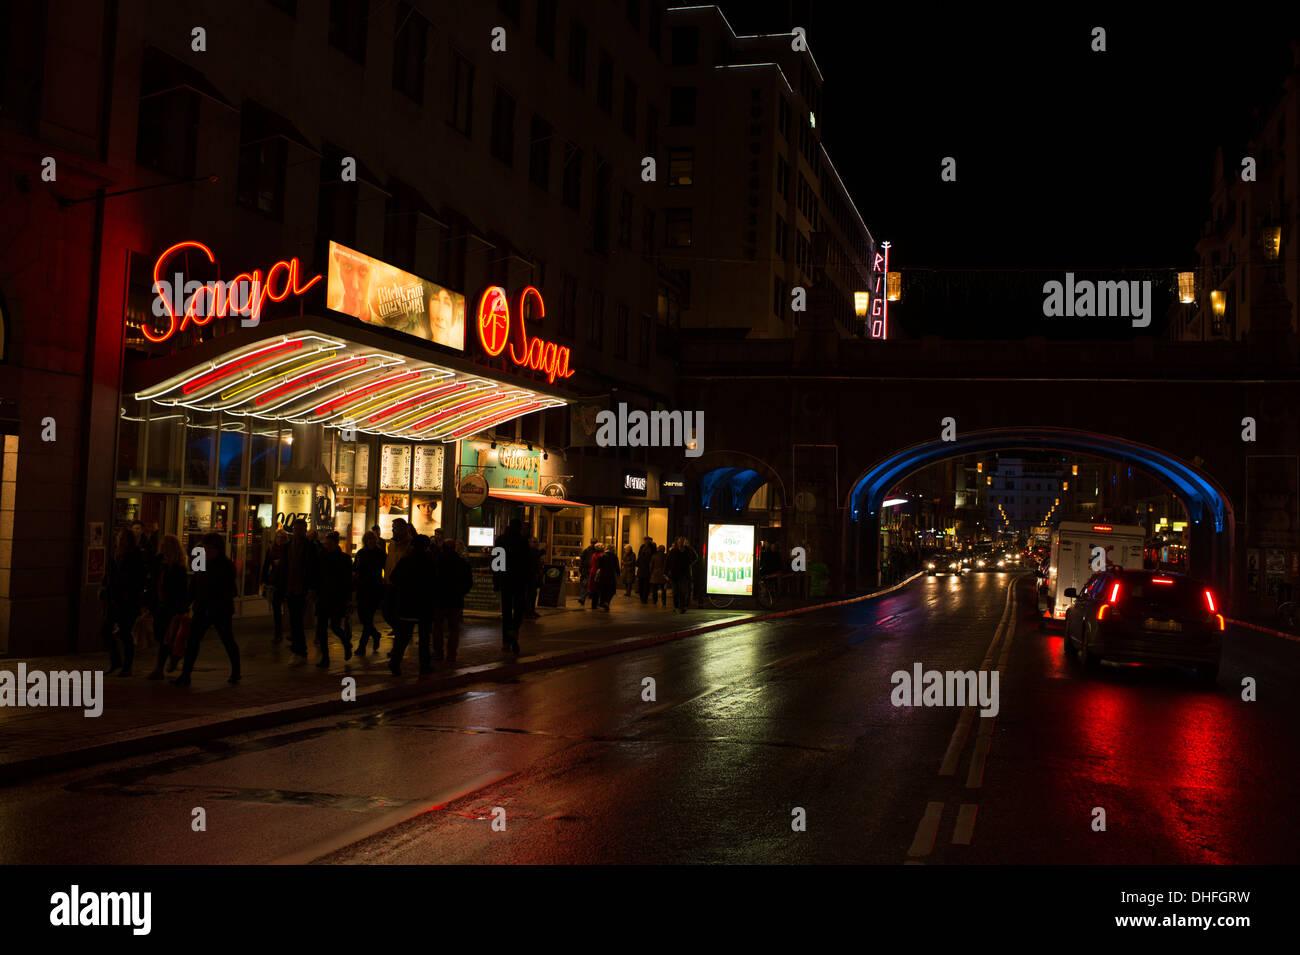 Classic cinema Saga in Stockholm, Sweden. Opened in 1937. - Stock Image